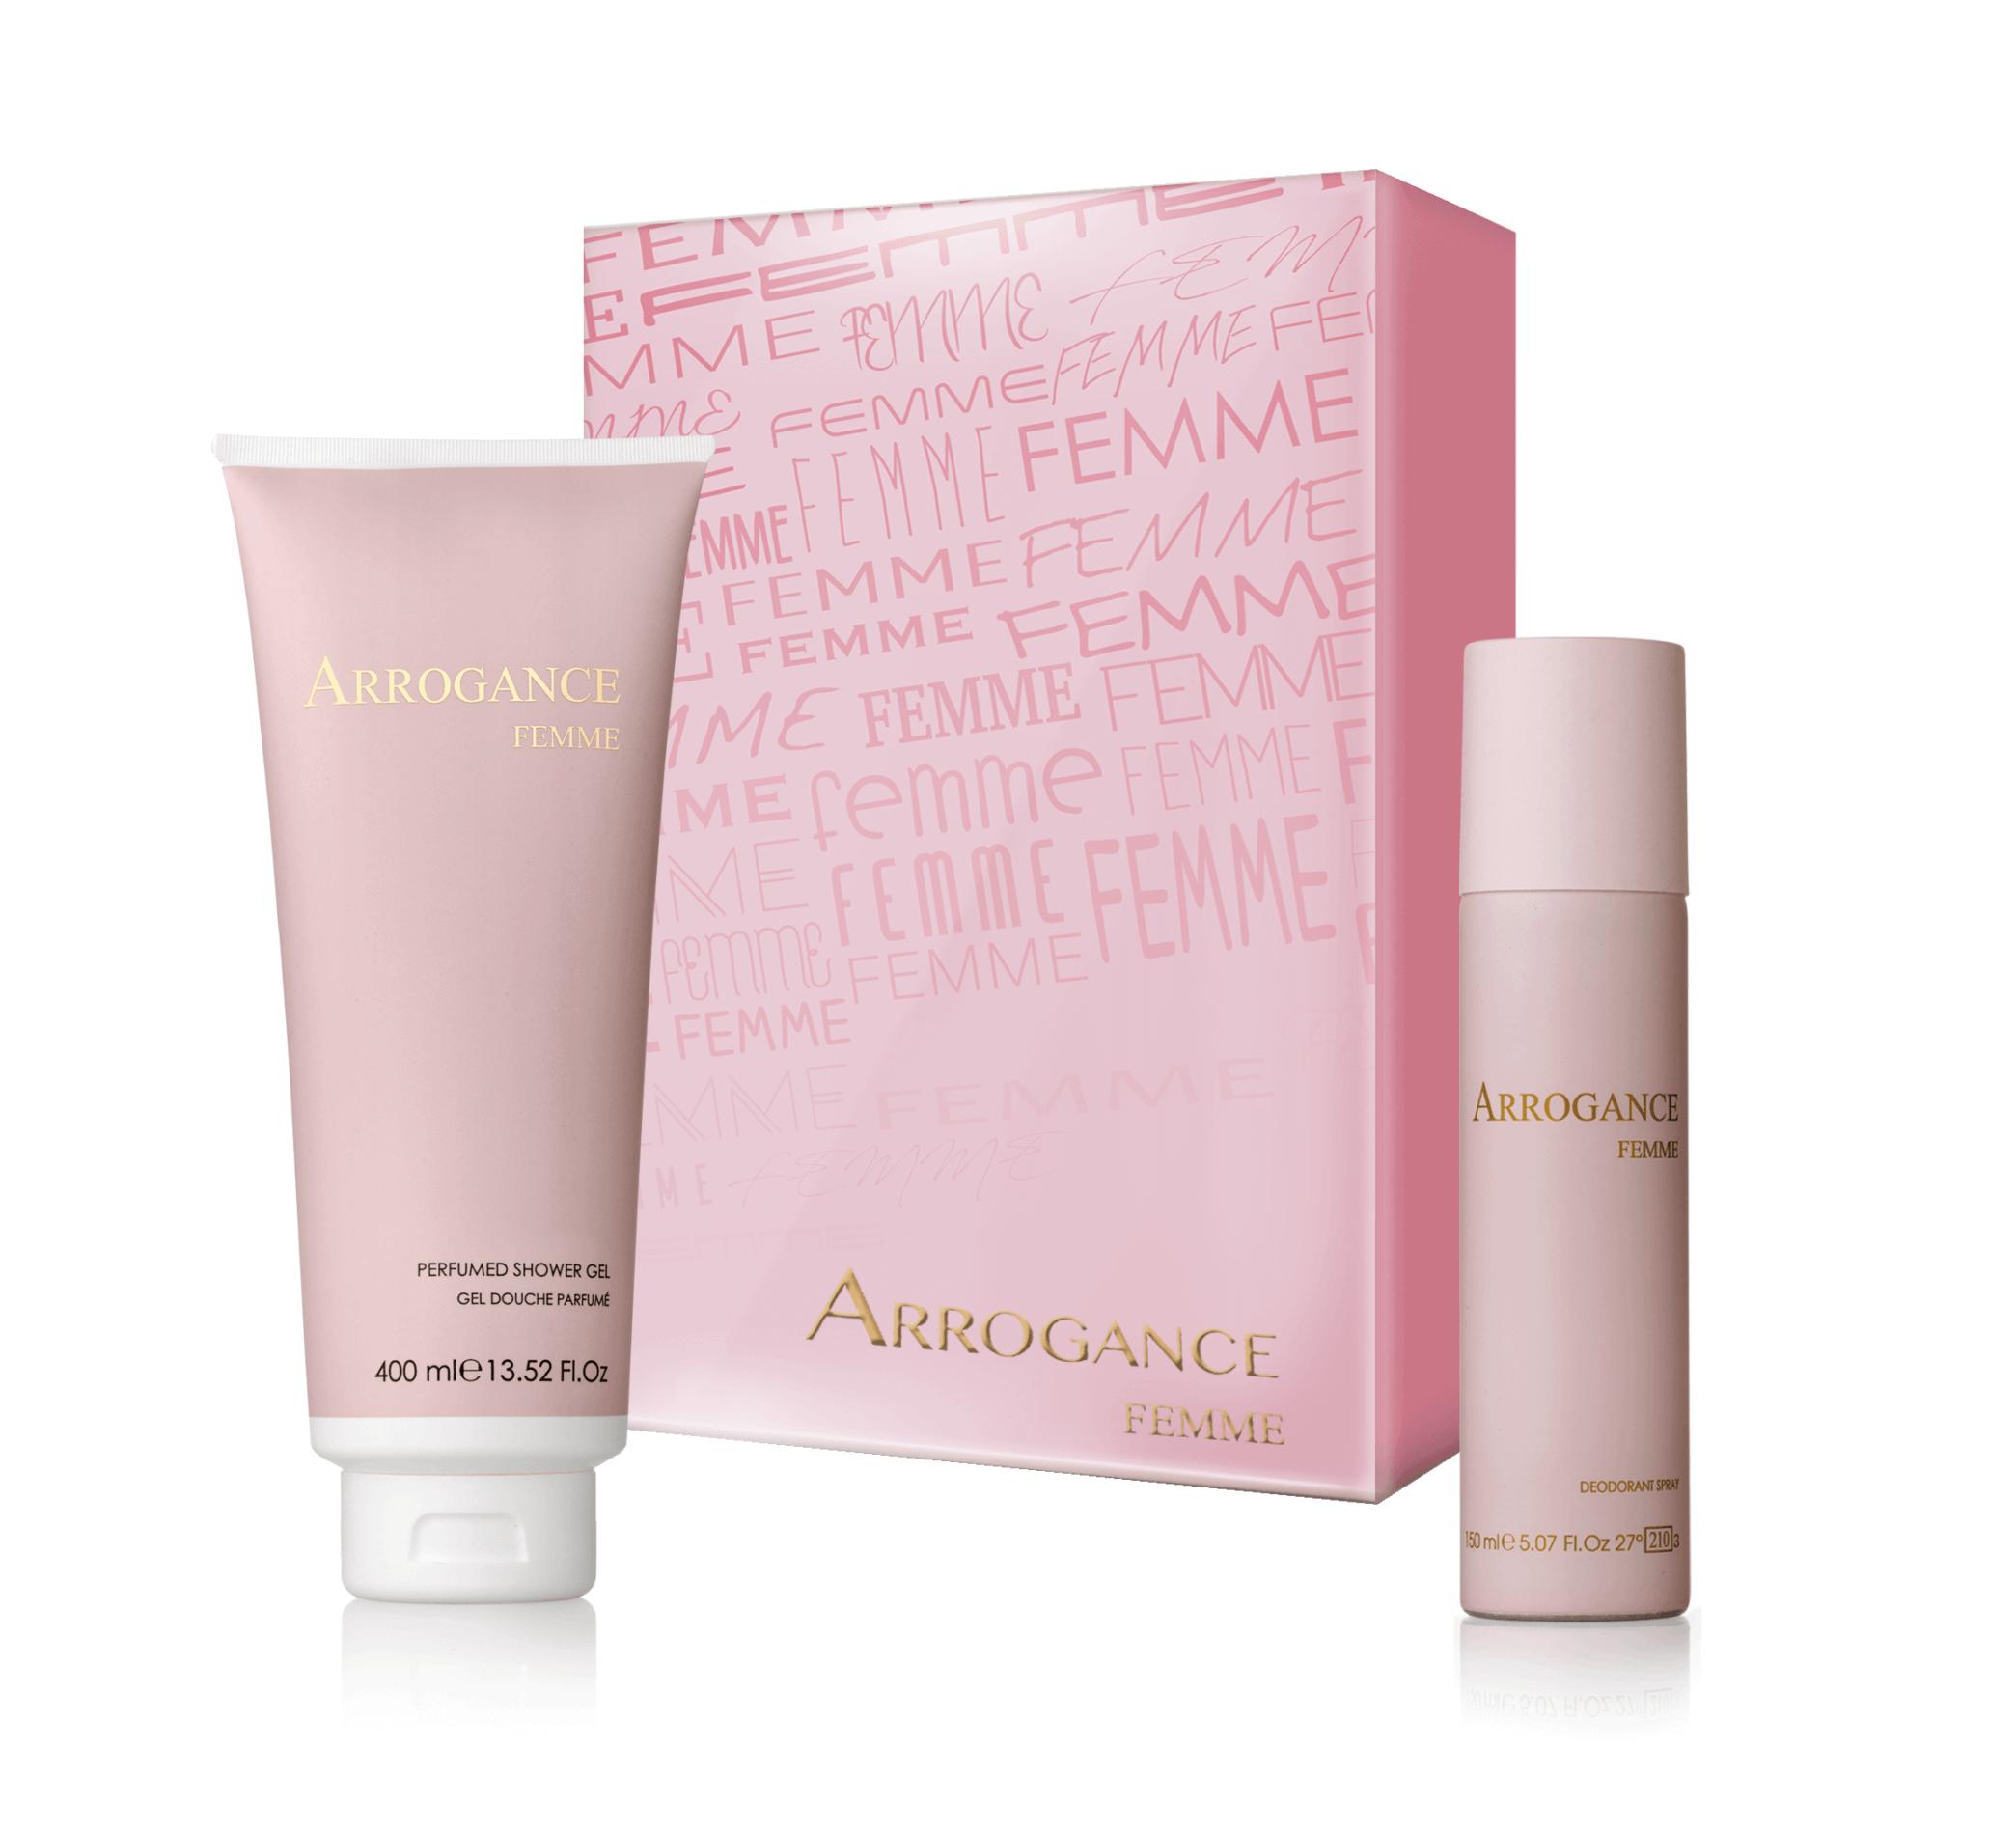 Femme Shower Gel + Spray Deodorante